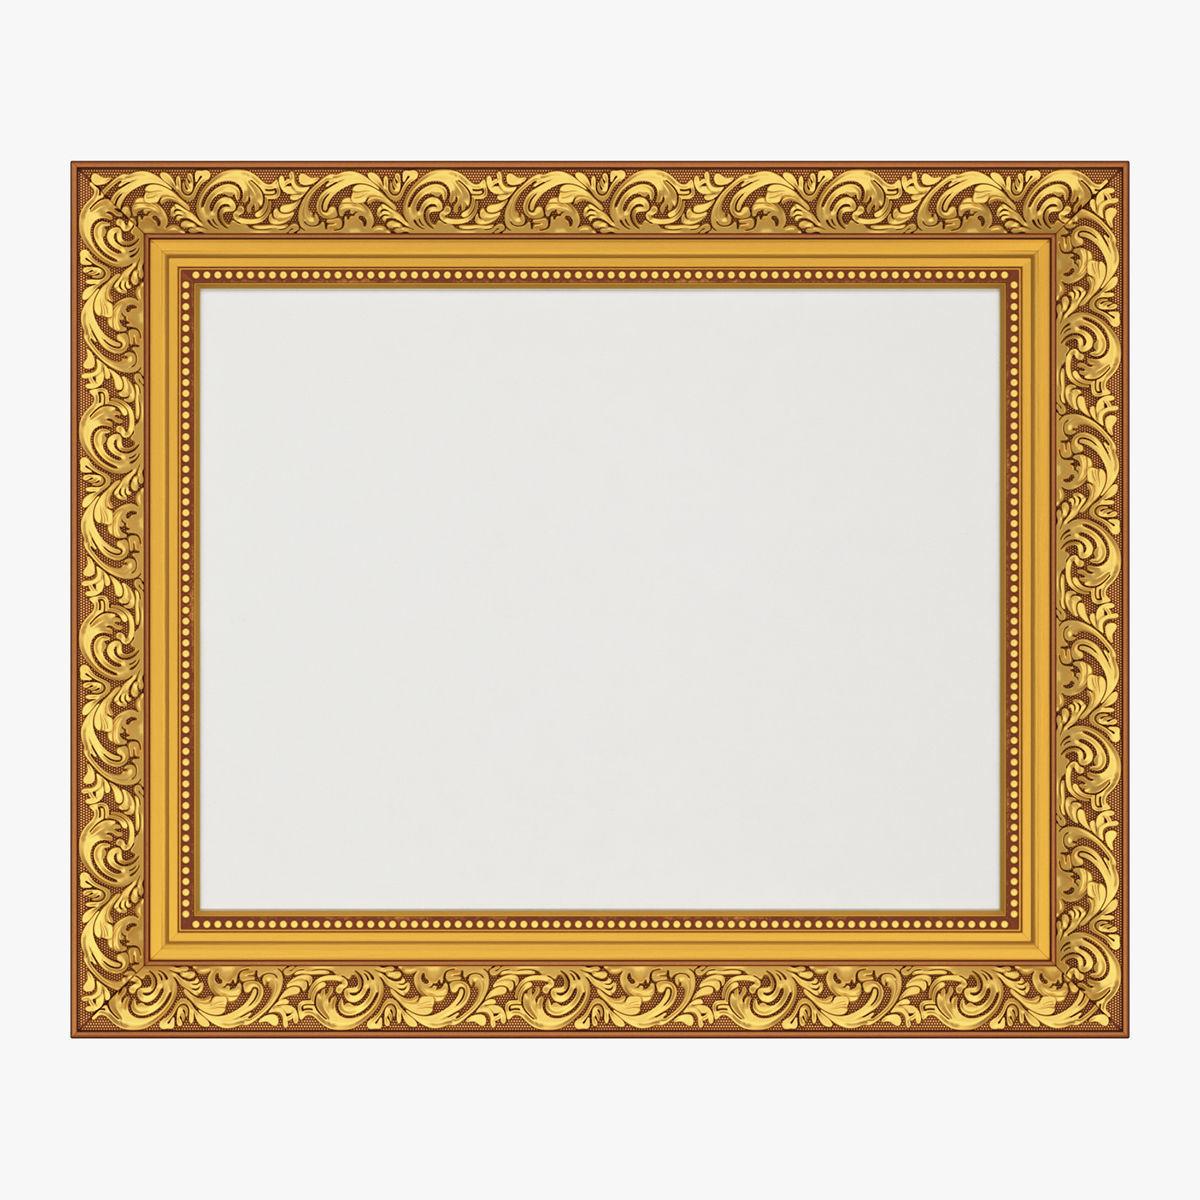 Frame picture gold v7